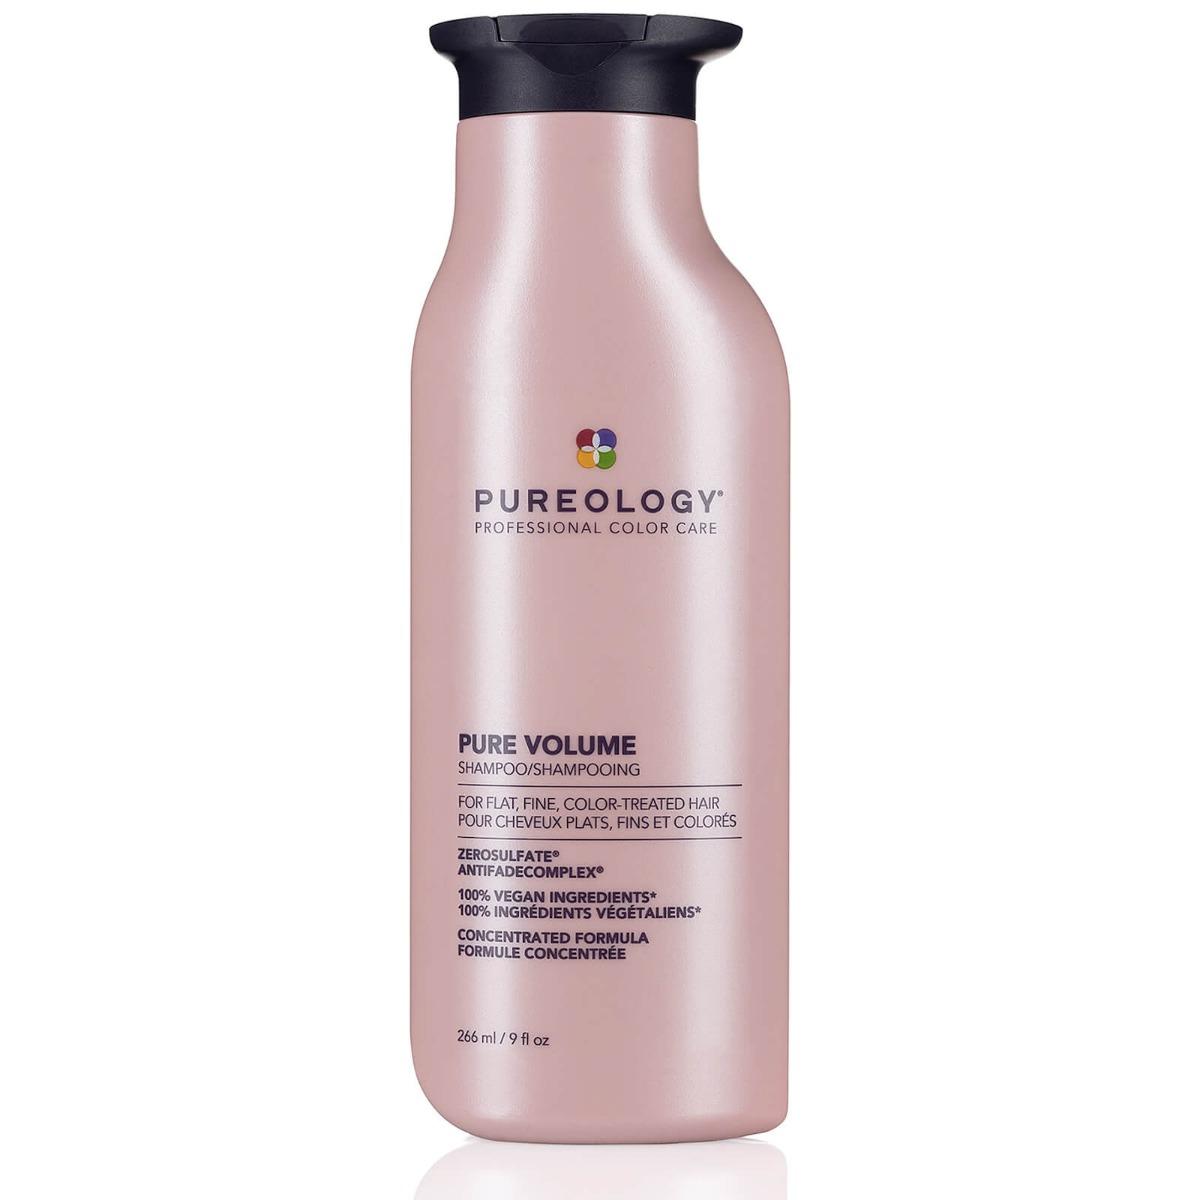 Cosmetics Pureology Pure Volume Shampoo 266ml